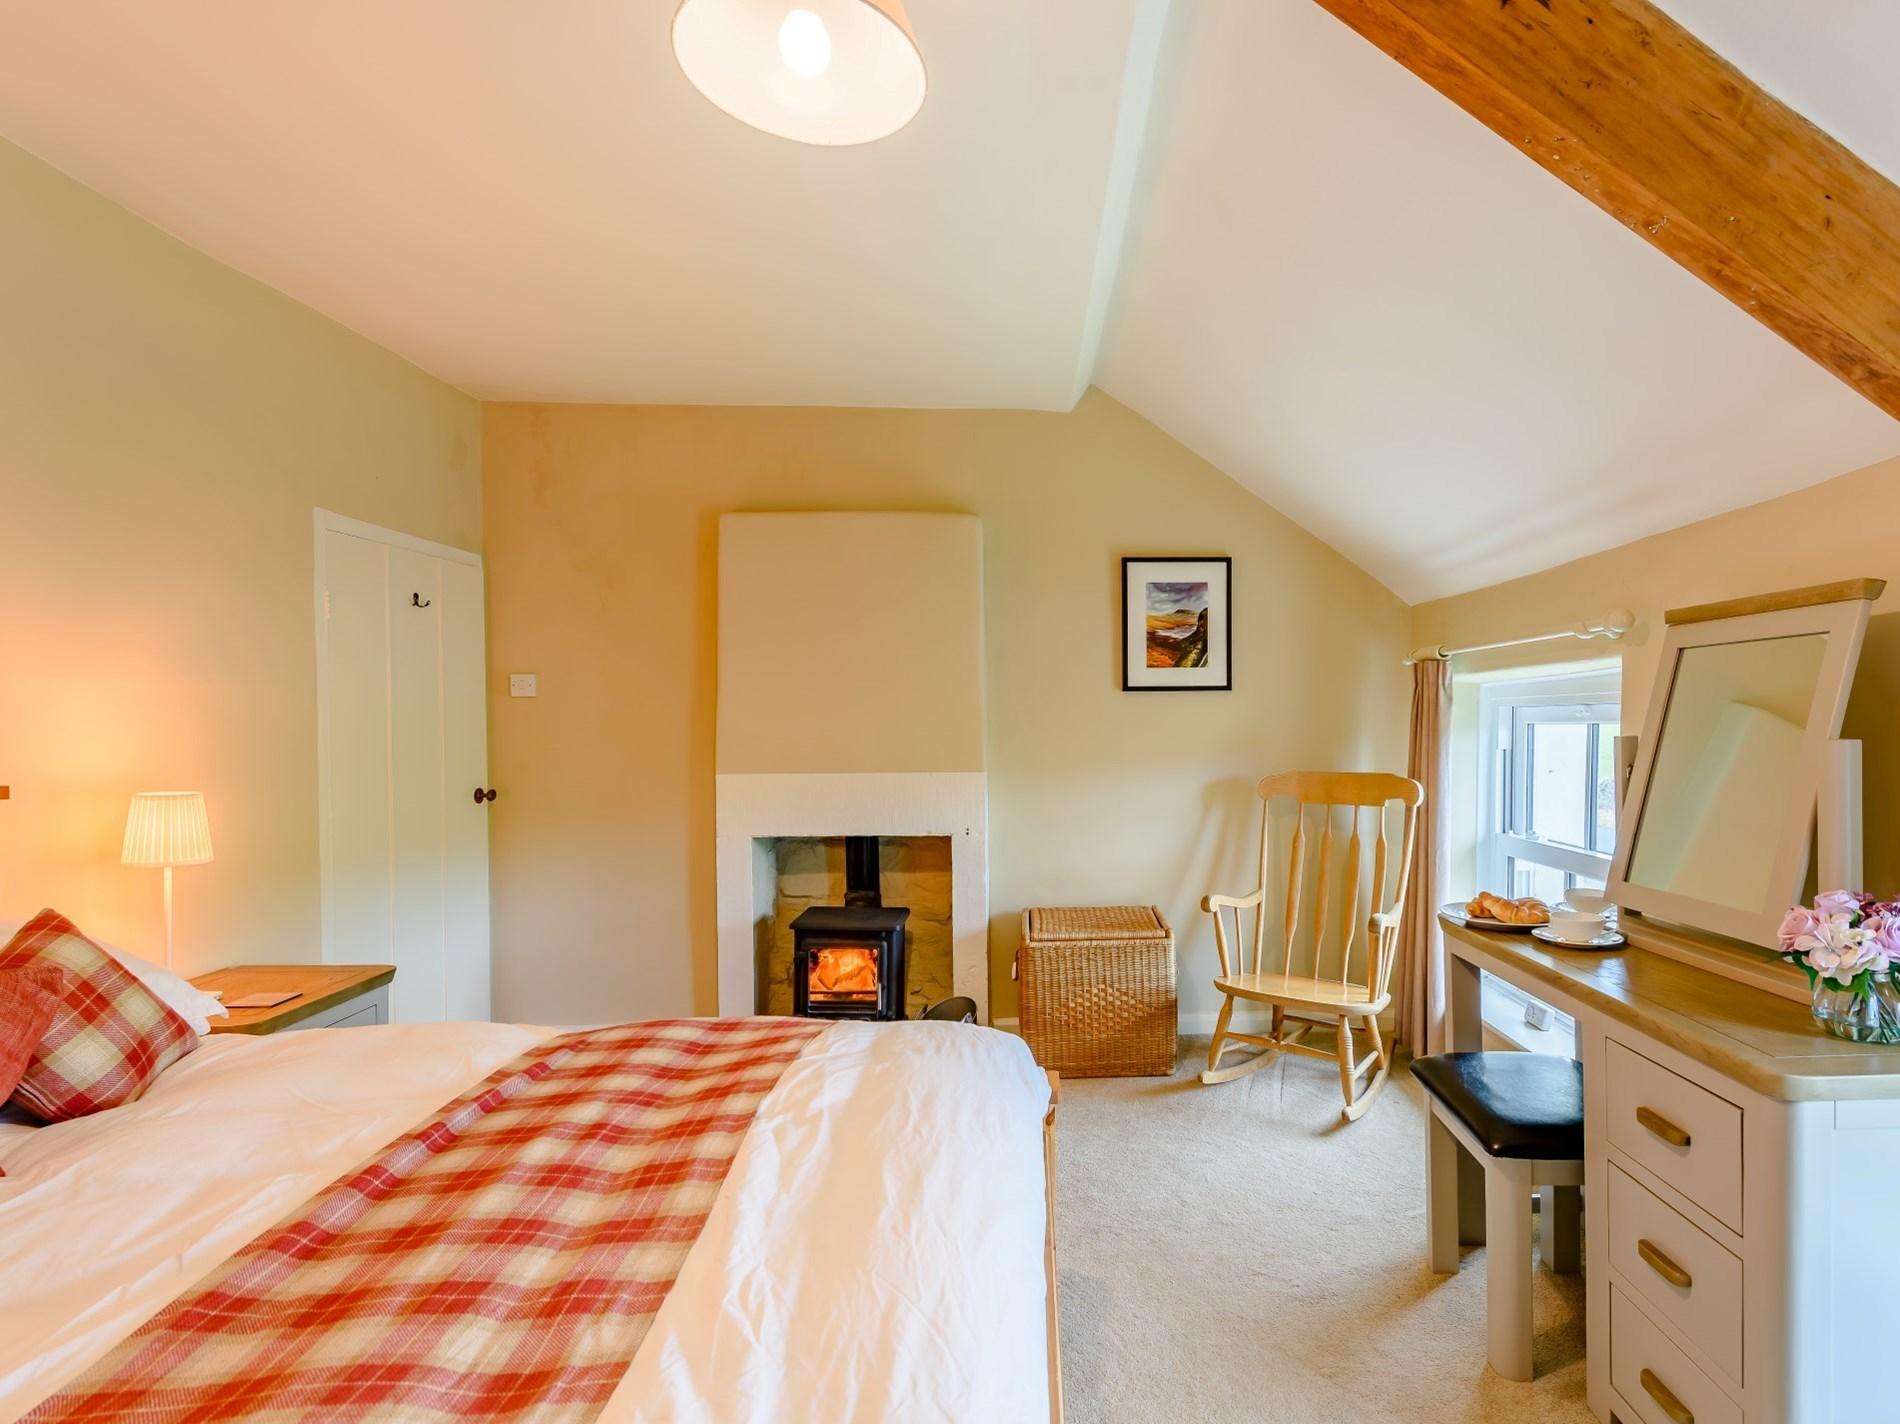 2 Bedroom Cottage in Brampton, Scottish Borders